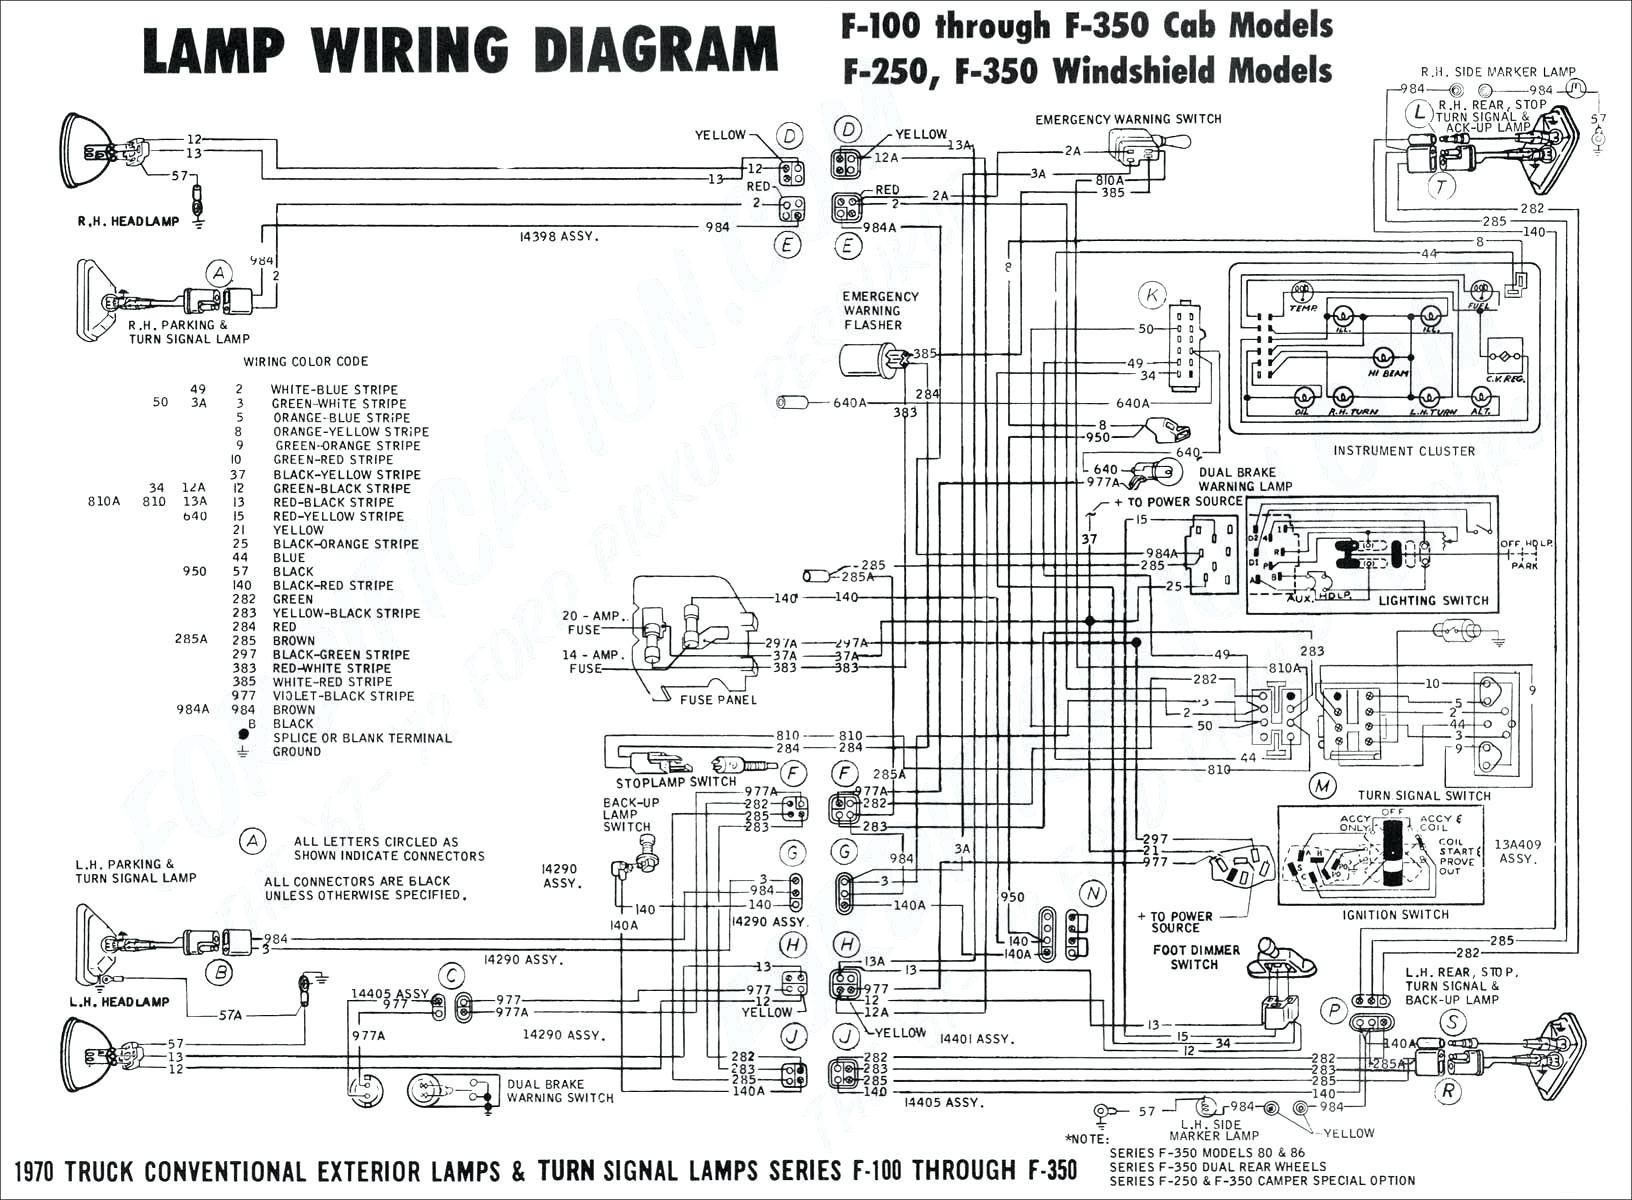 Truck Lite 900 Wiring Diagram Rear Tail Light Wiring Diagram 1979 ford Plete Wiring Diagrams • Of Truck Lite 900 Wiring Diagram